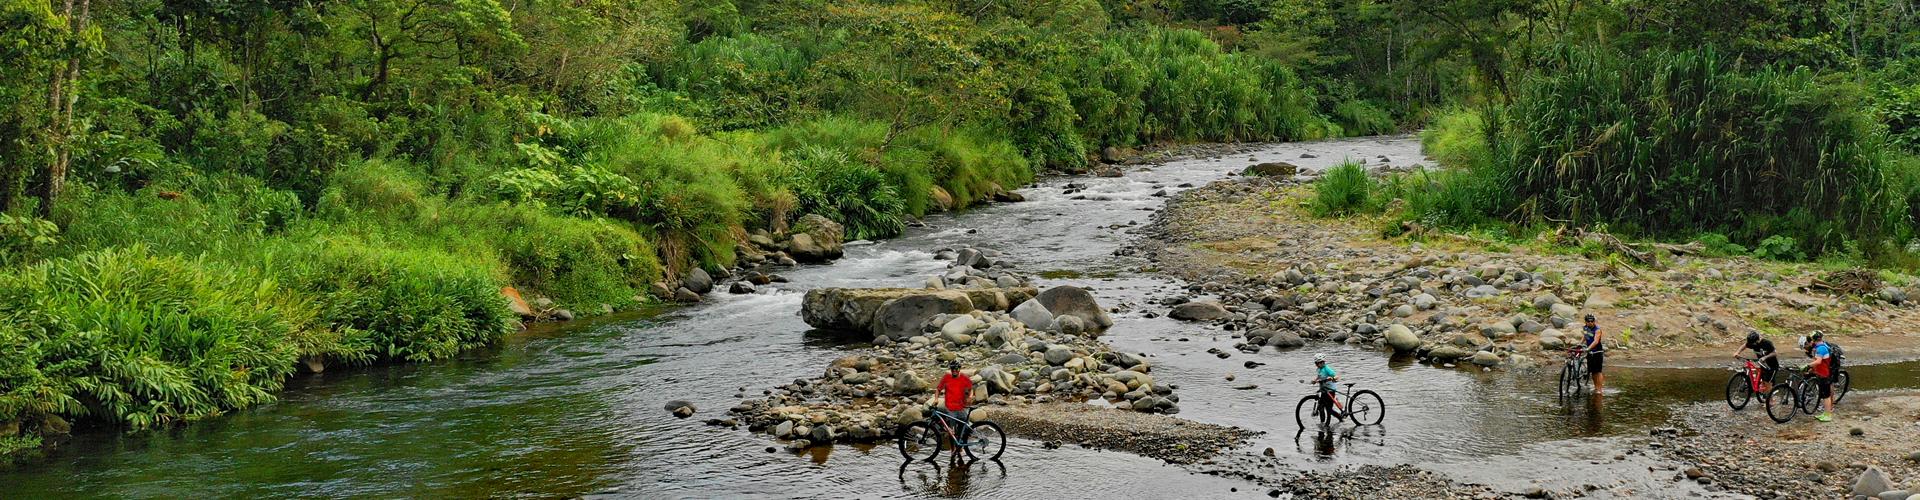 Cycle Costa Rica & Panama